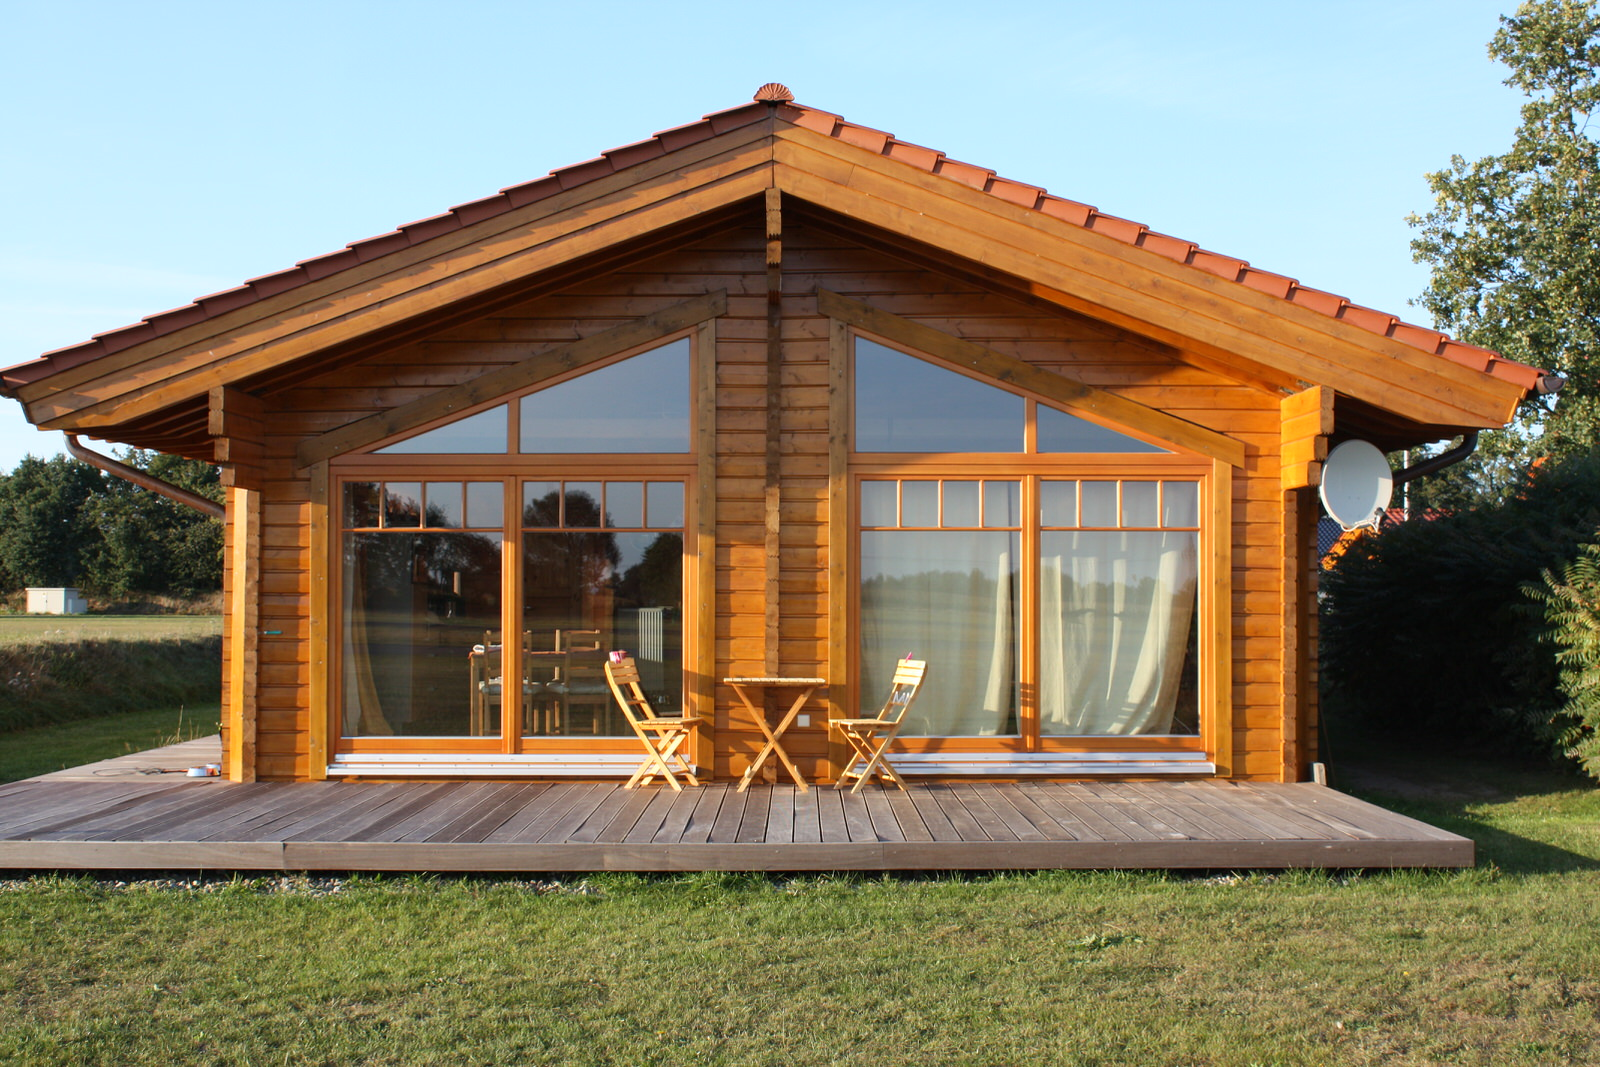 Beliebt 72,54 qm | Jagdhaus Willi | Nordic Haus Blockhaus | Holzhaus SD77